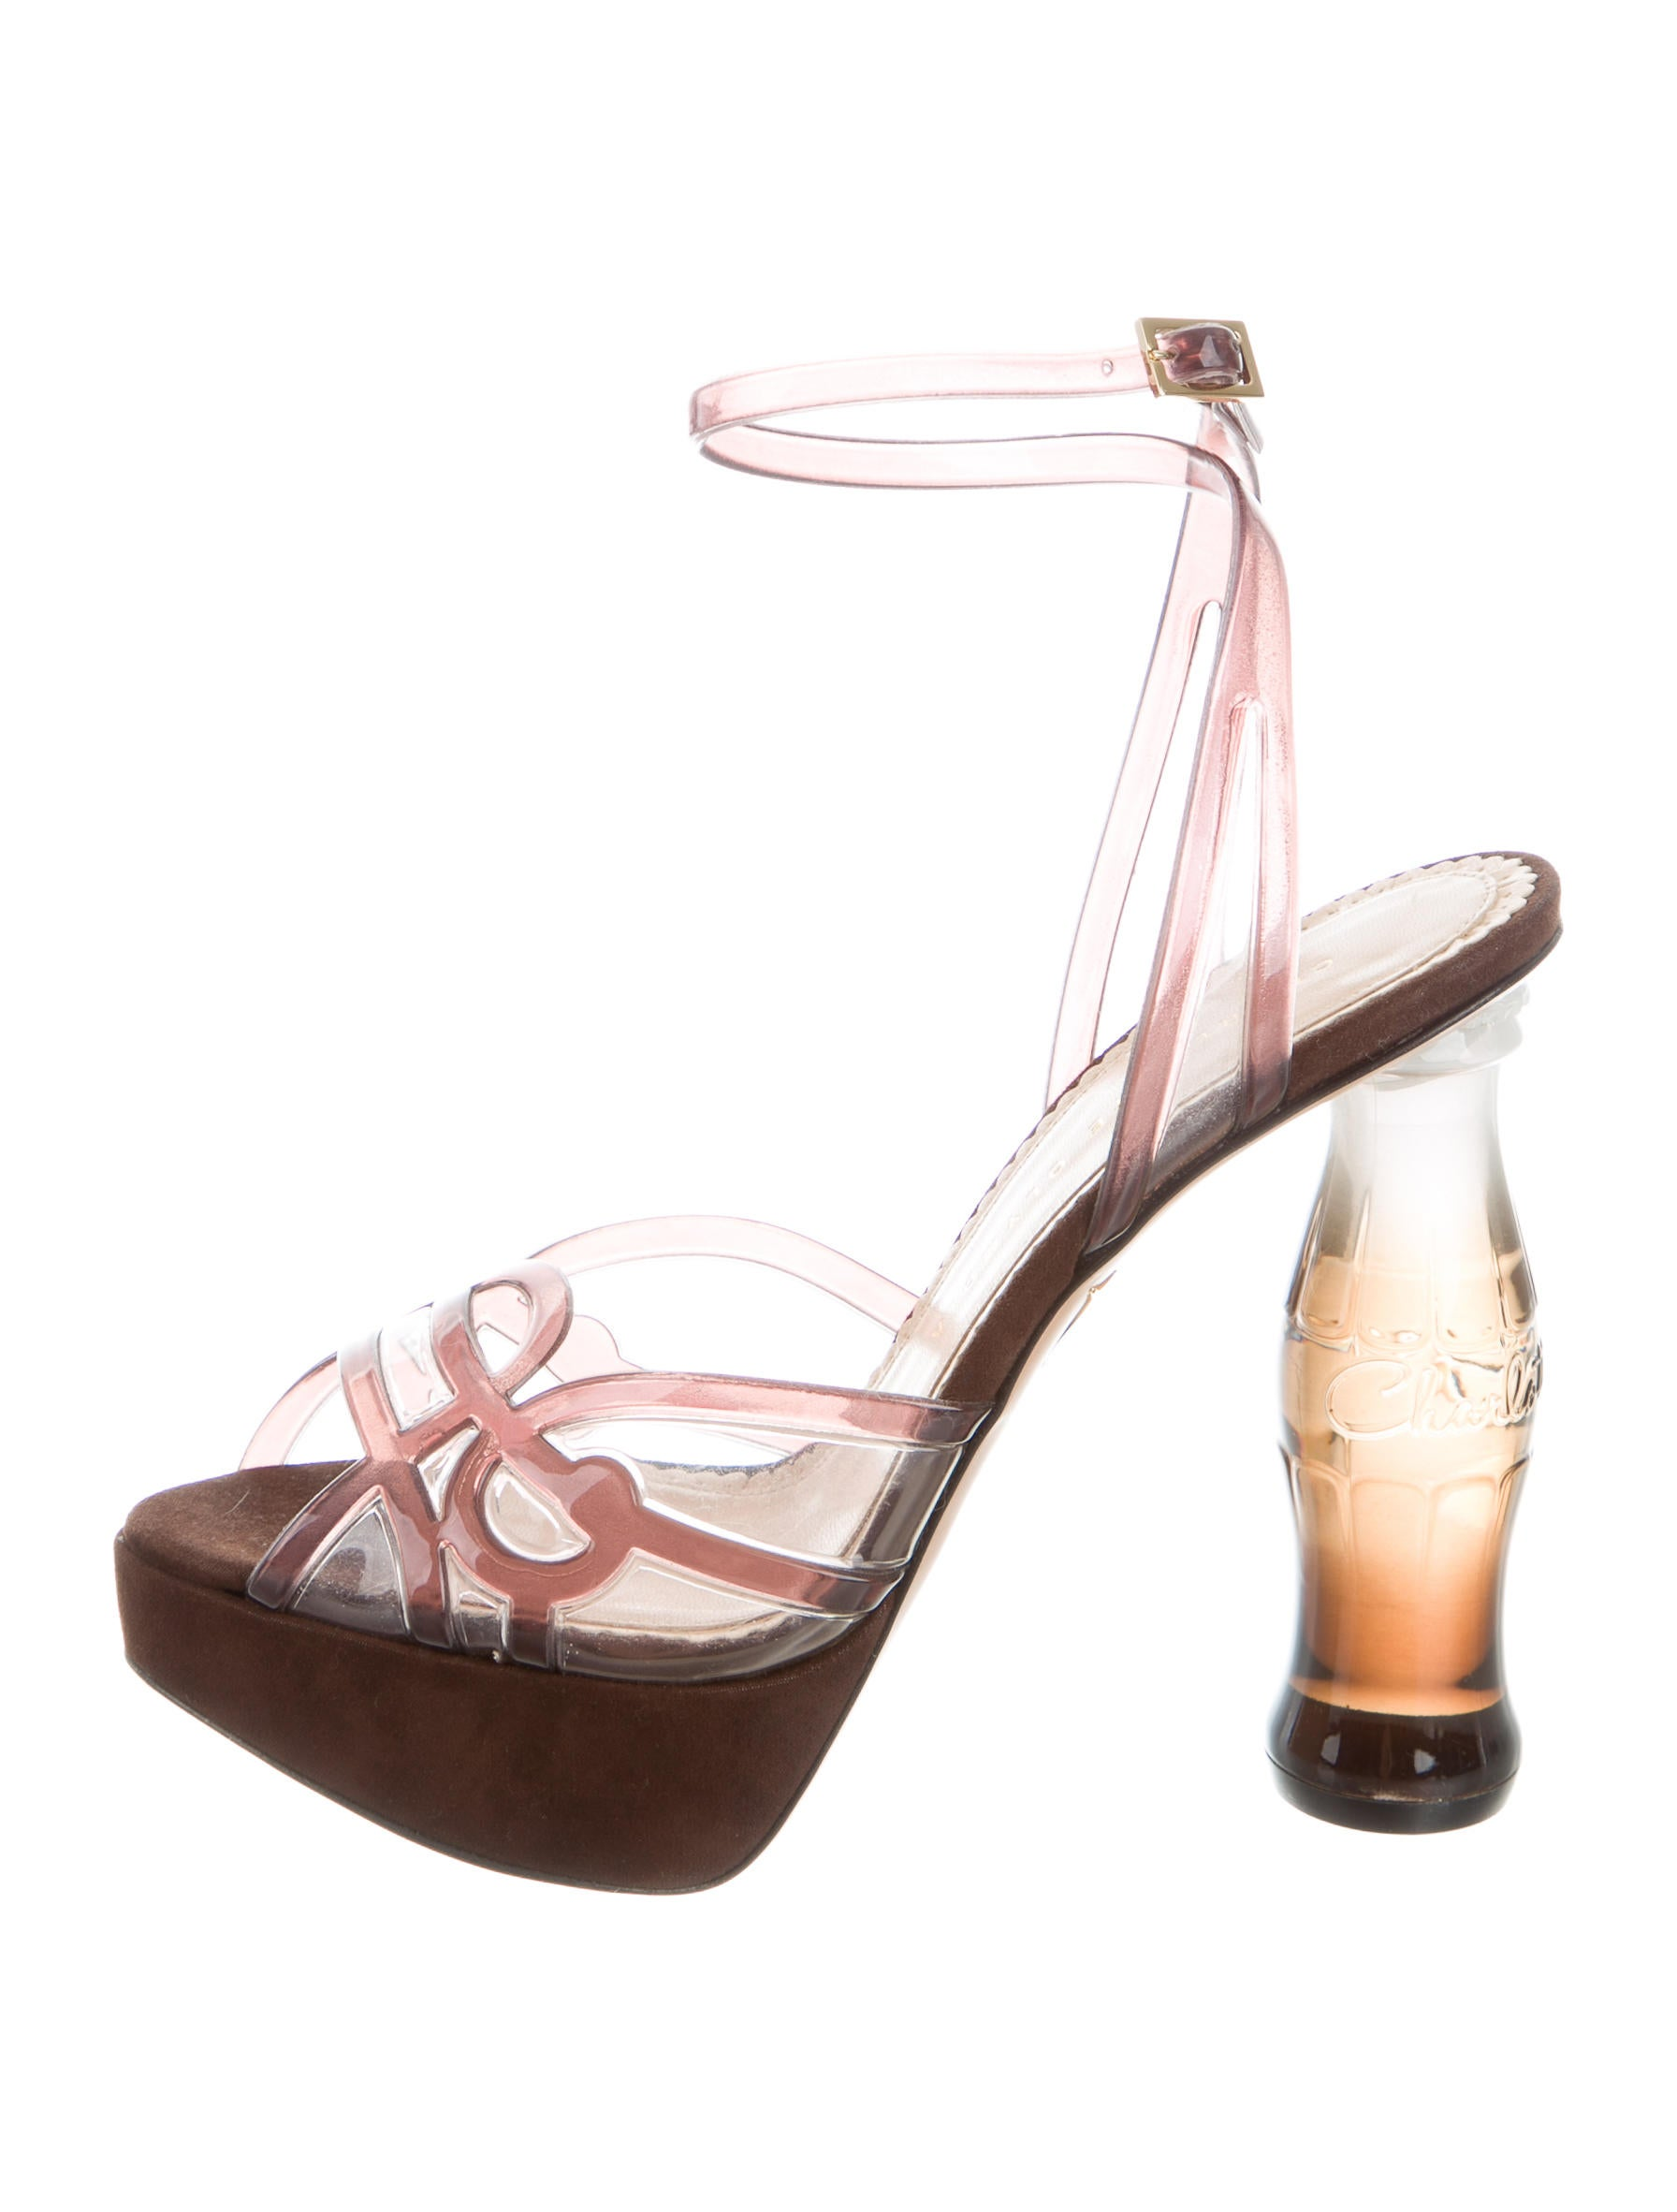 olympia soda platform sandals shoes cio23654